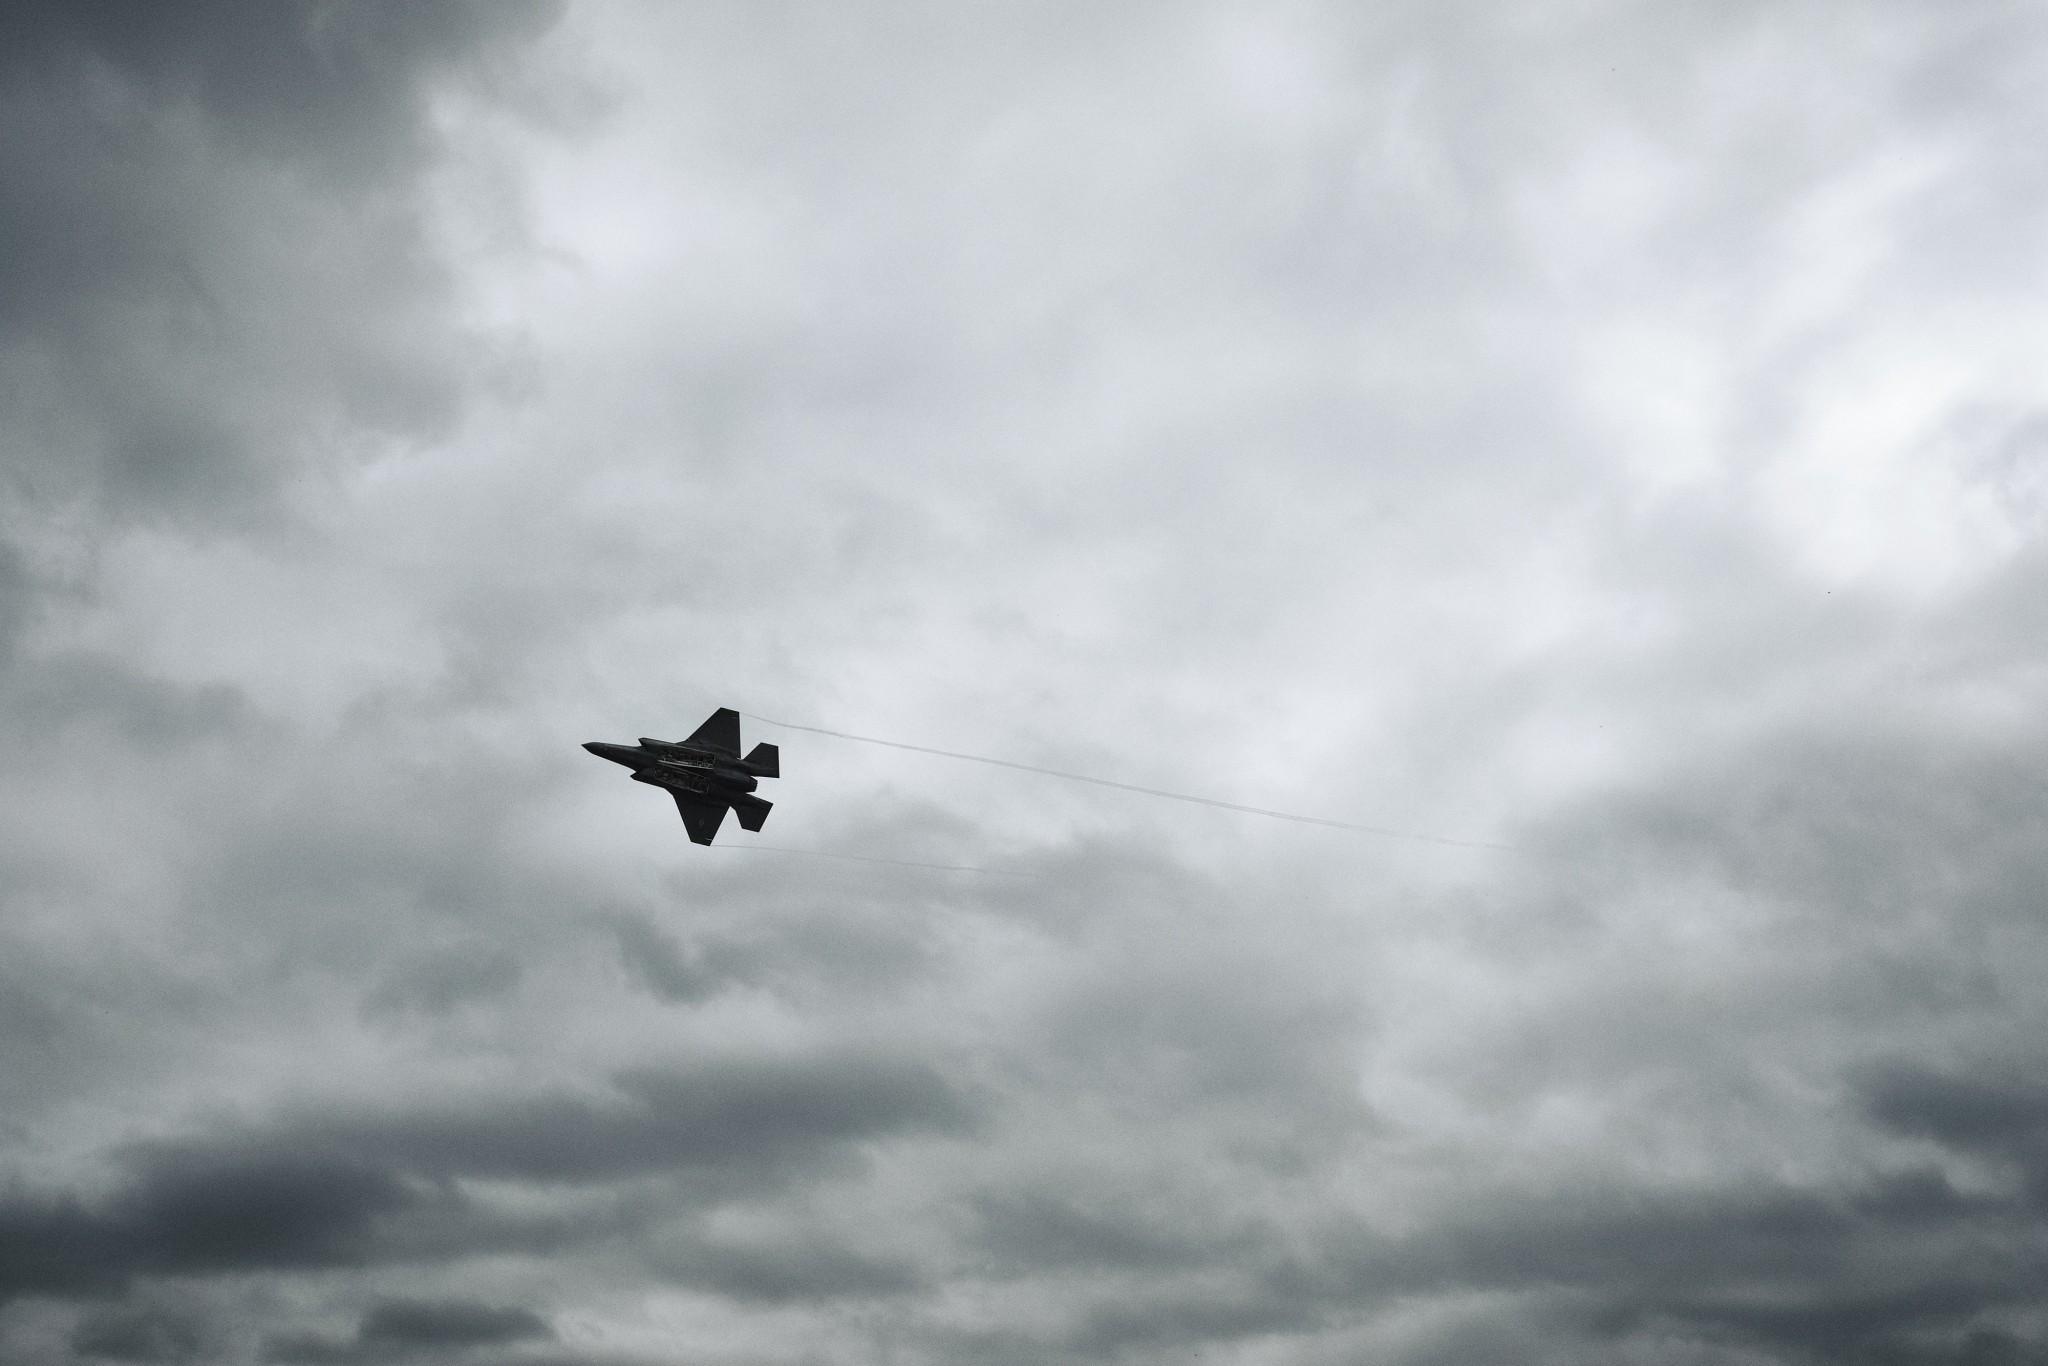 11---USAF-F-35A-Lightning-II---Capt.-Andrew-Dojo-Olson.jpg